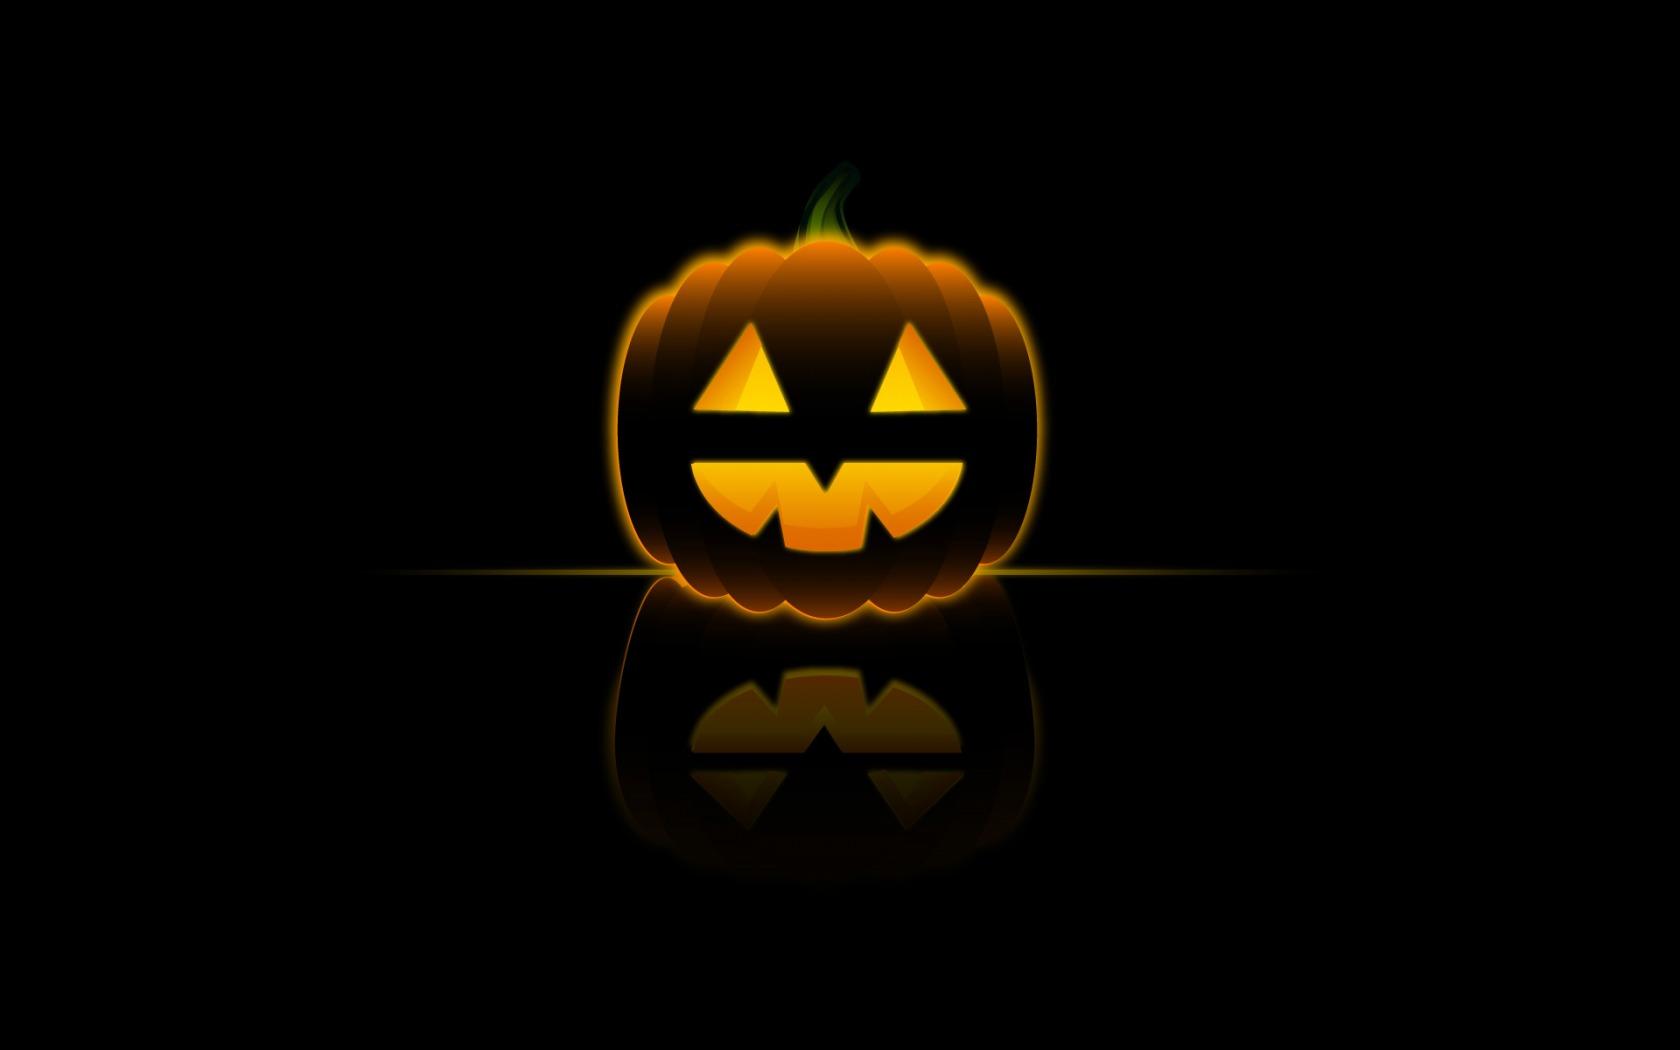 Halloween Pumpkin Wallpaper Iphone.Halloween Pumpkin Wallpaper Halloween Holidays Wallpapers In Jpg